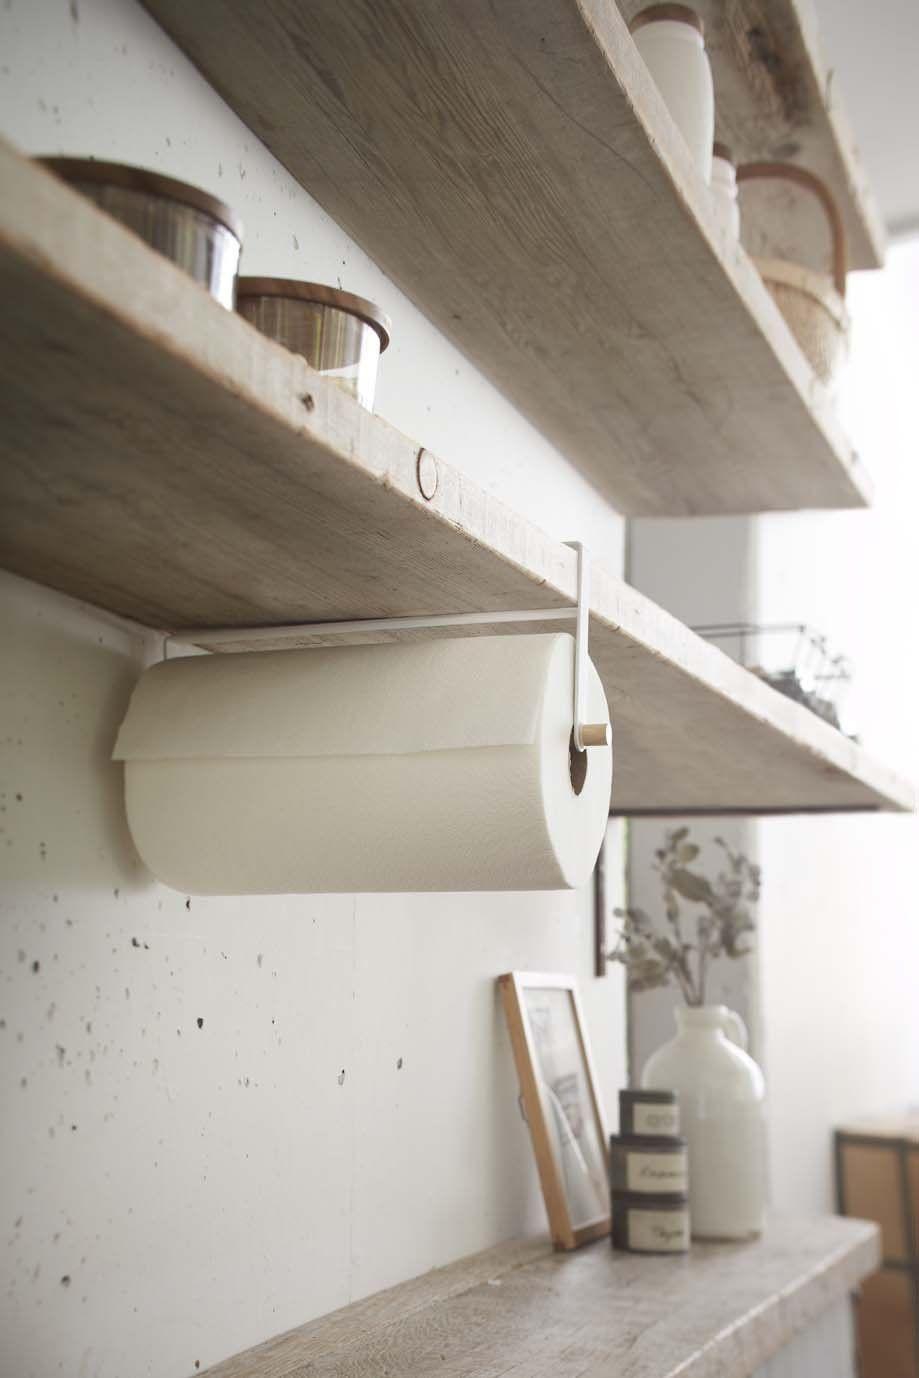 Yamazaki Home Tosca Under Shelf Paper Towel Holder Kitchen